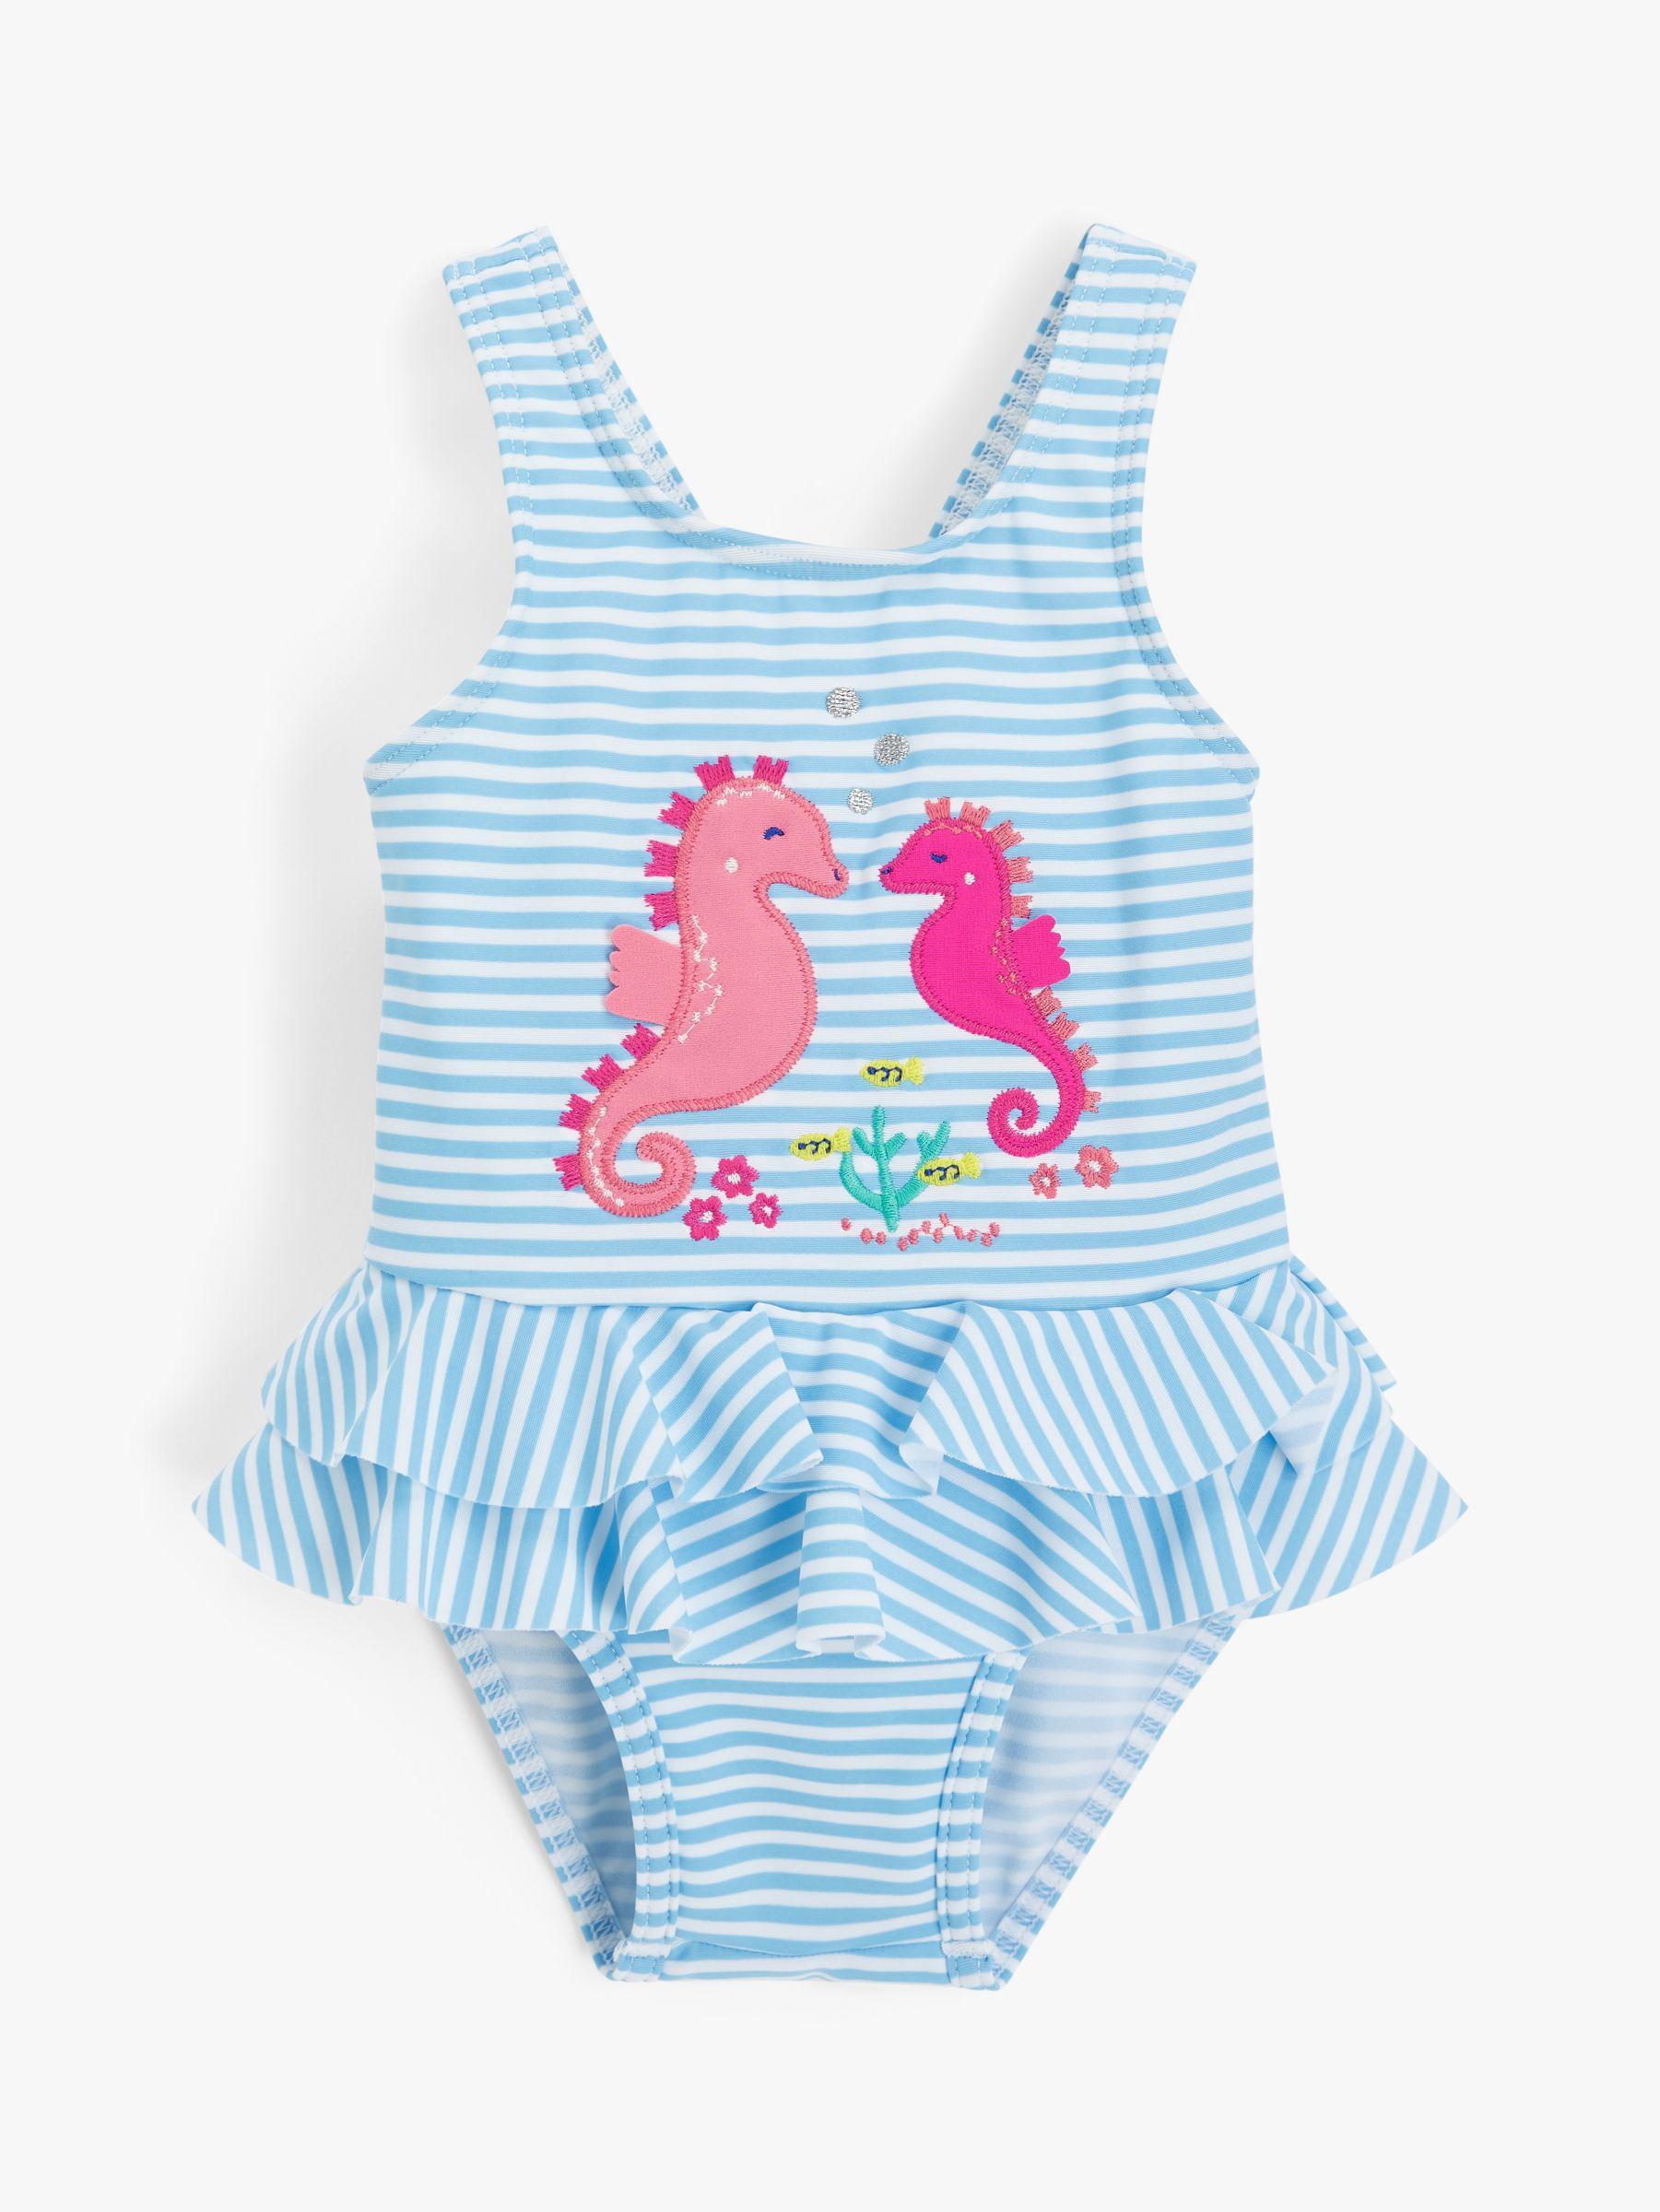 John Lewis John Lewis & Partners Baby Stripe Seahorse Print Swimsuit, Blue